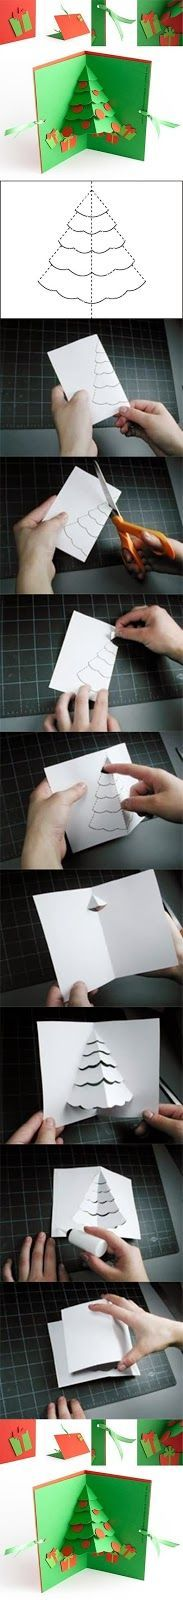 DIY Christmas Tree Pop Up Card DIY Christmas